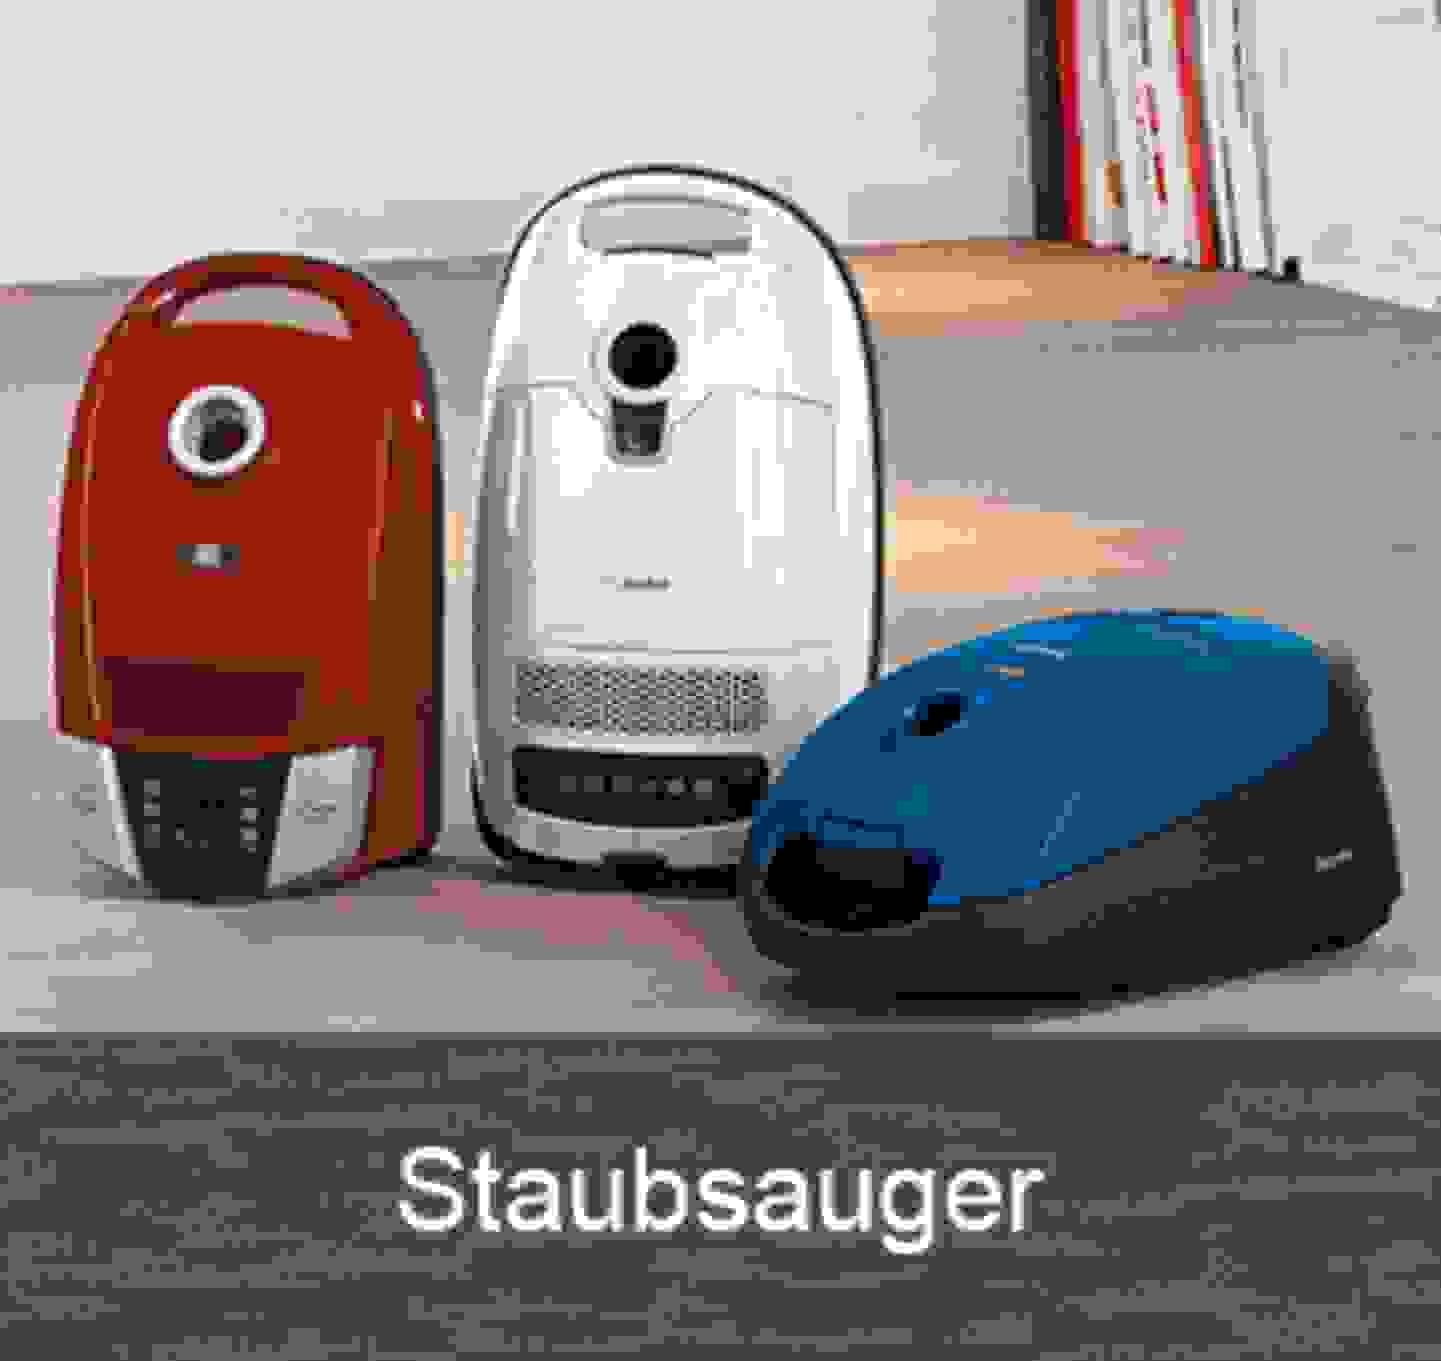 Staubsauger